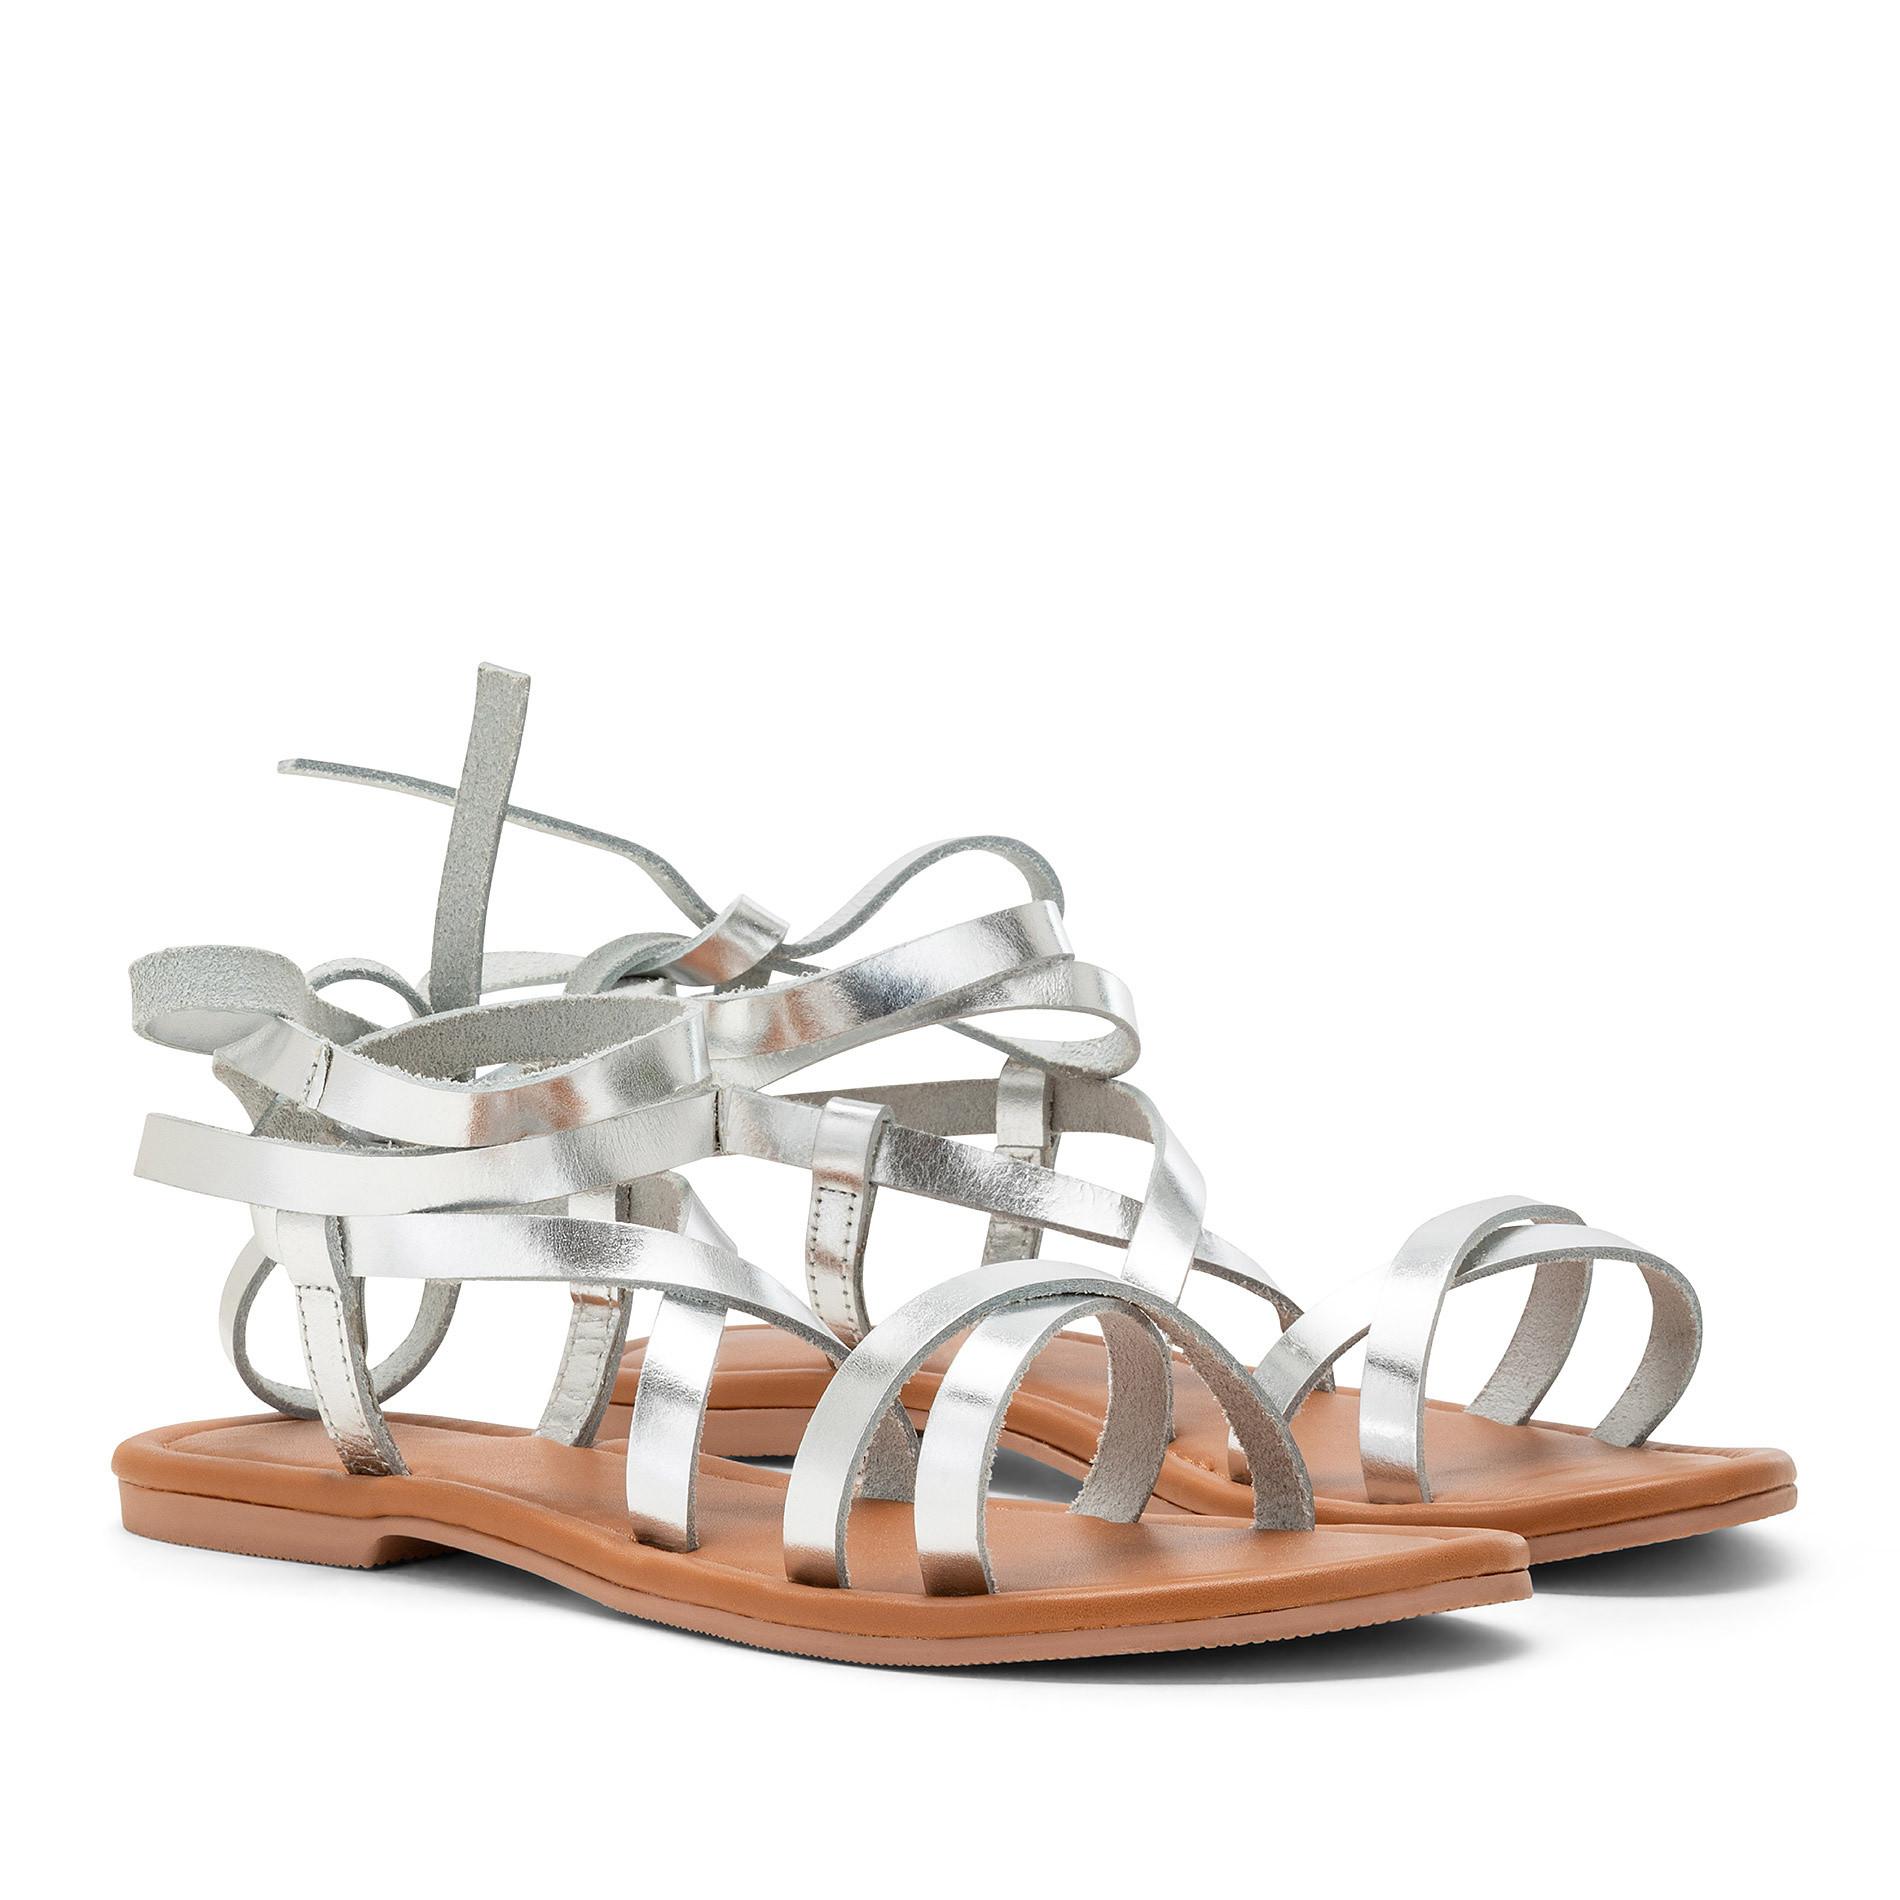 Sandalo con fascette metallizzate, Grigio argento, large image number 0